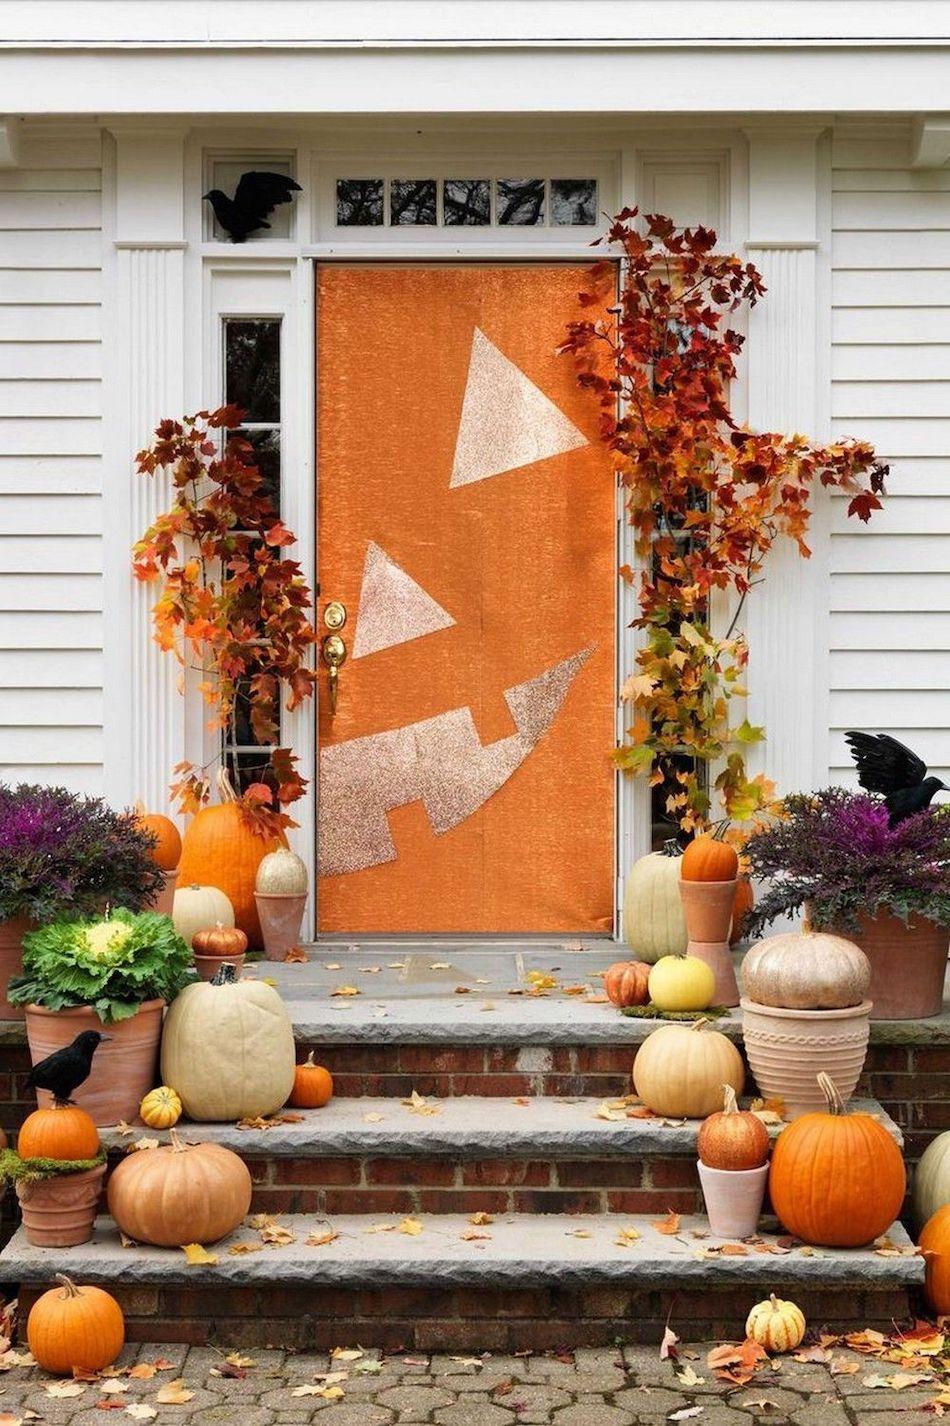 Halloween front porch decor with Pumpkin Face Door via womansday